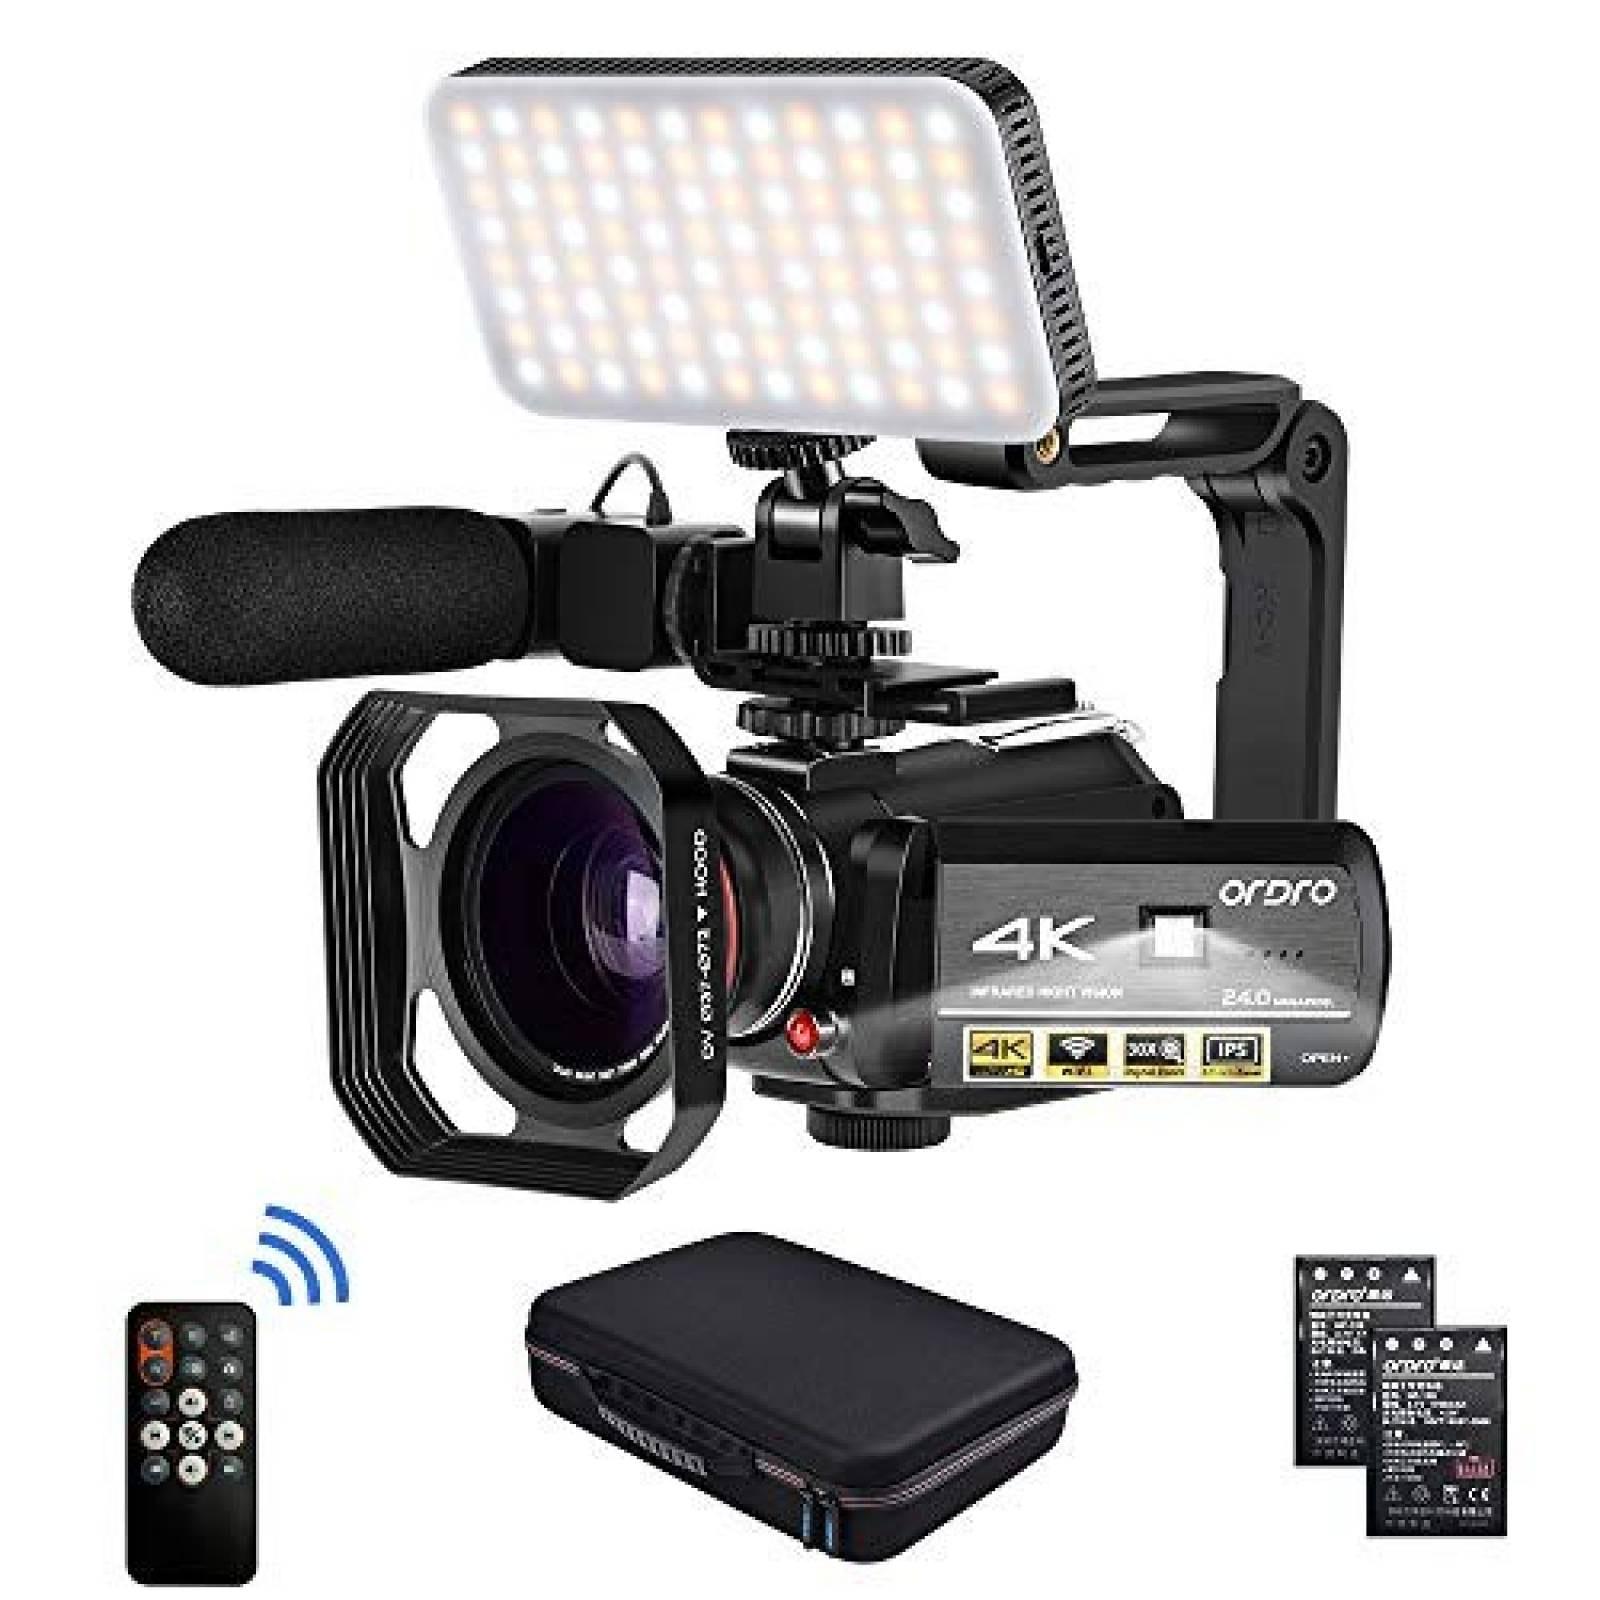 Videocámara ORDRO HDR-AC3 4K 24 FPS Visión Nocturna Luz LED